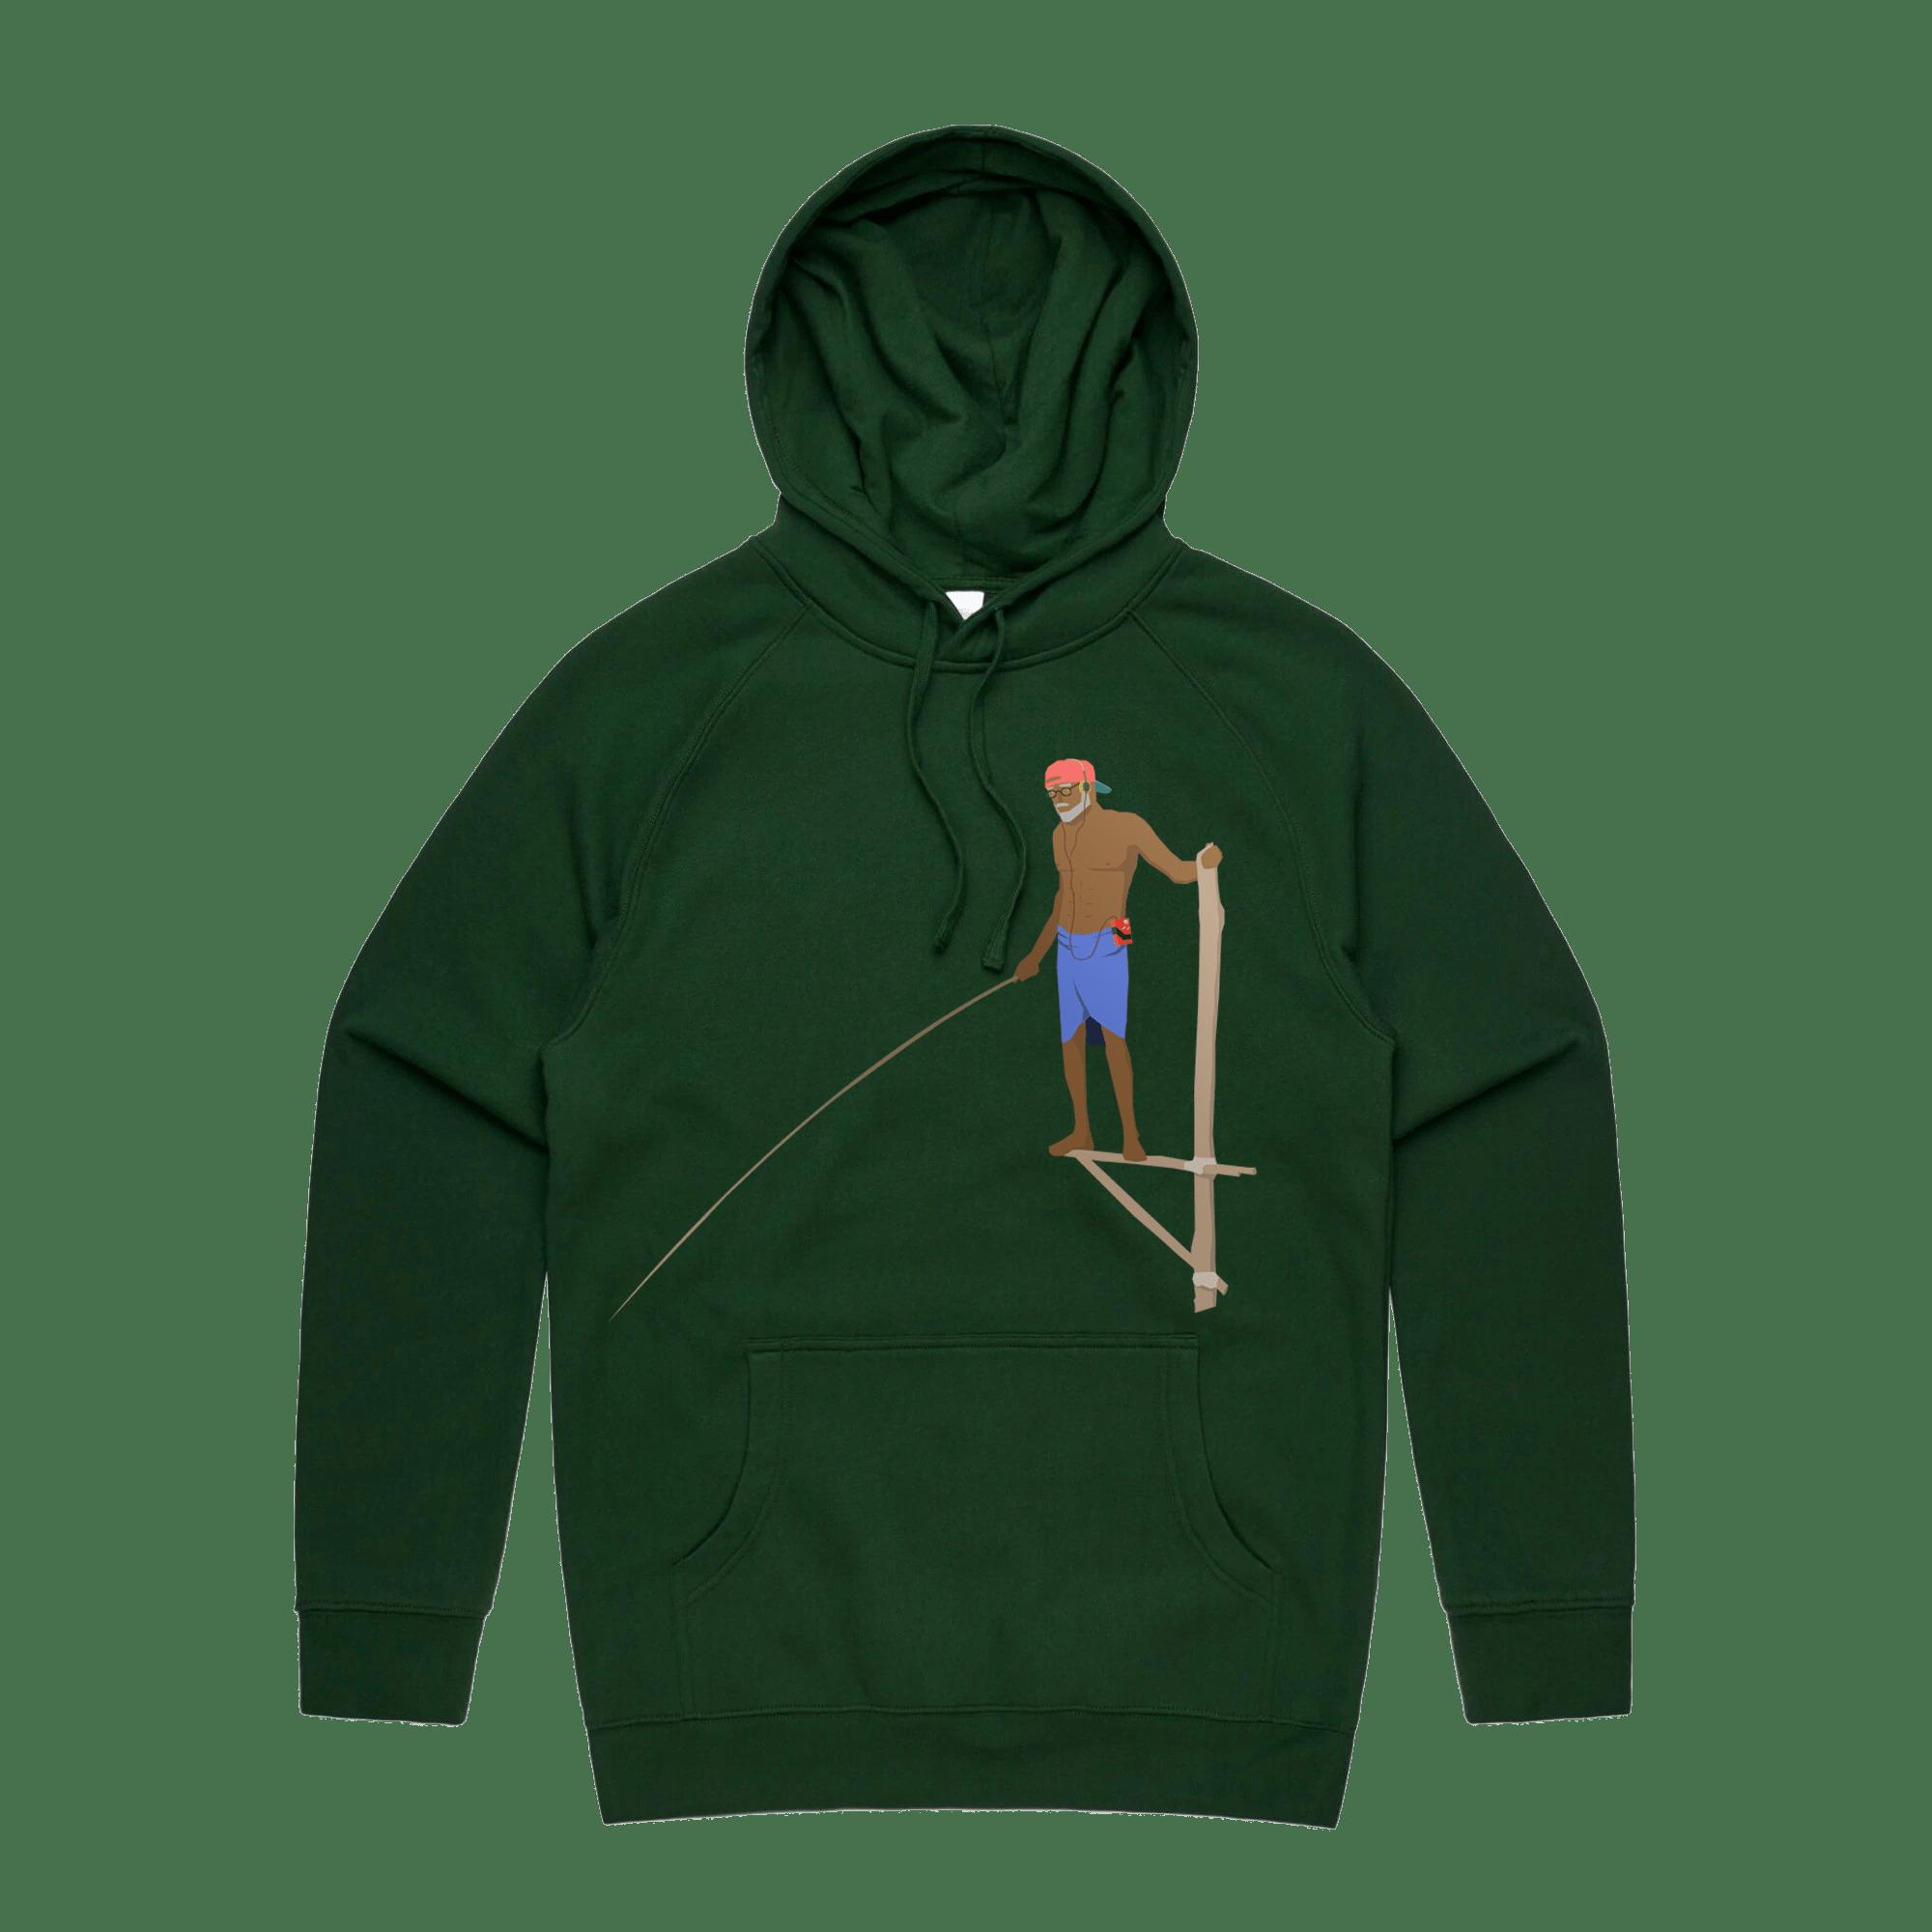 RETRO FISHERMAN Hoodie - FOREST GREEN